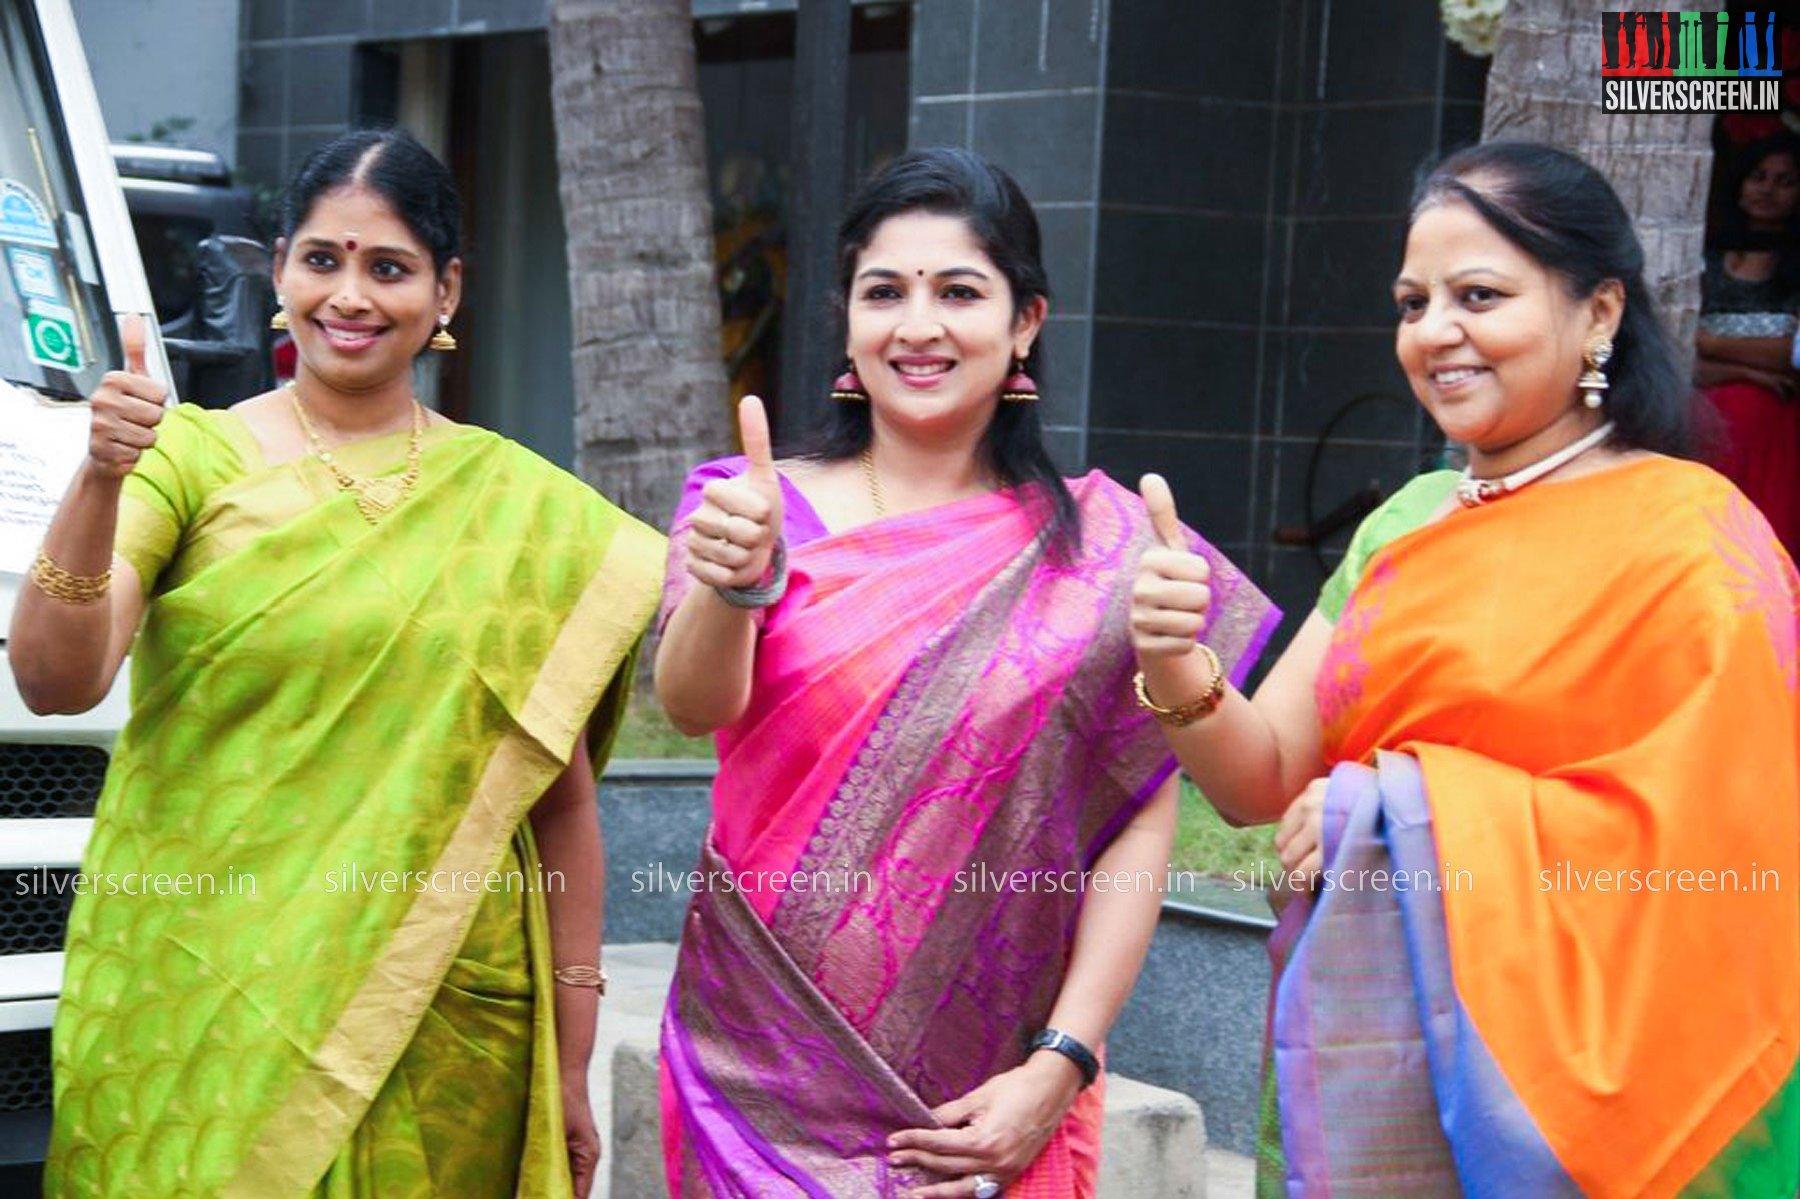 Singers Promote Carnatic Music Season Photos – Silverscreen in